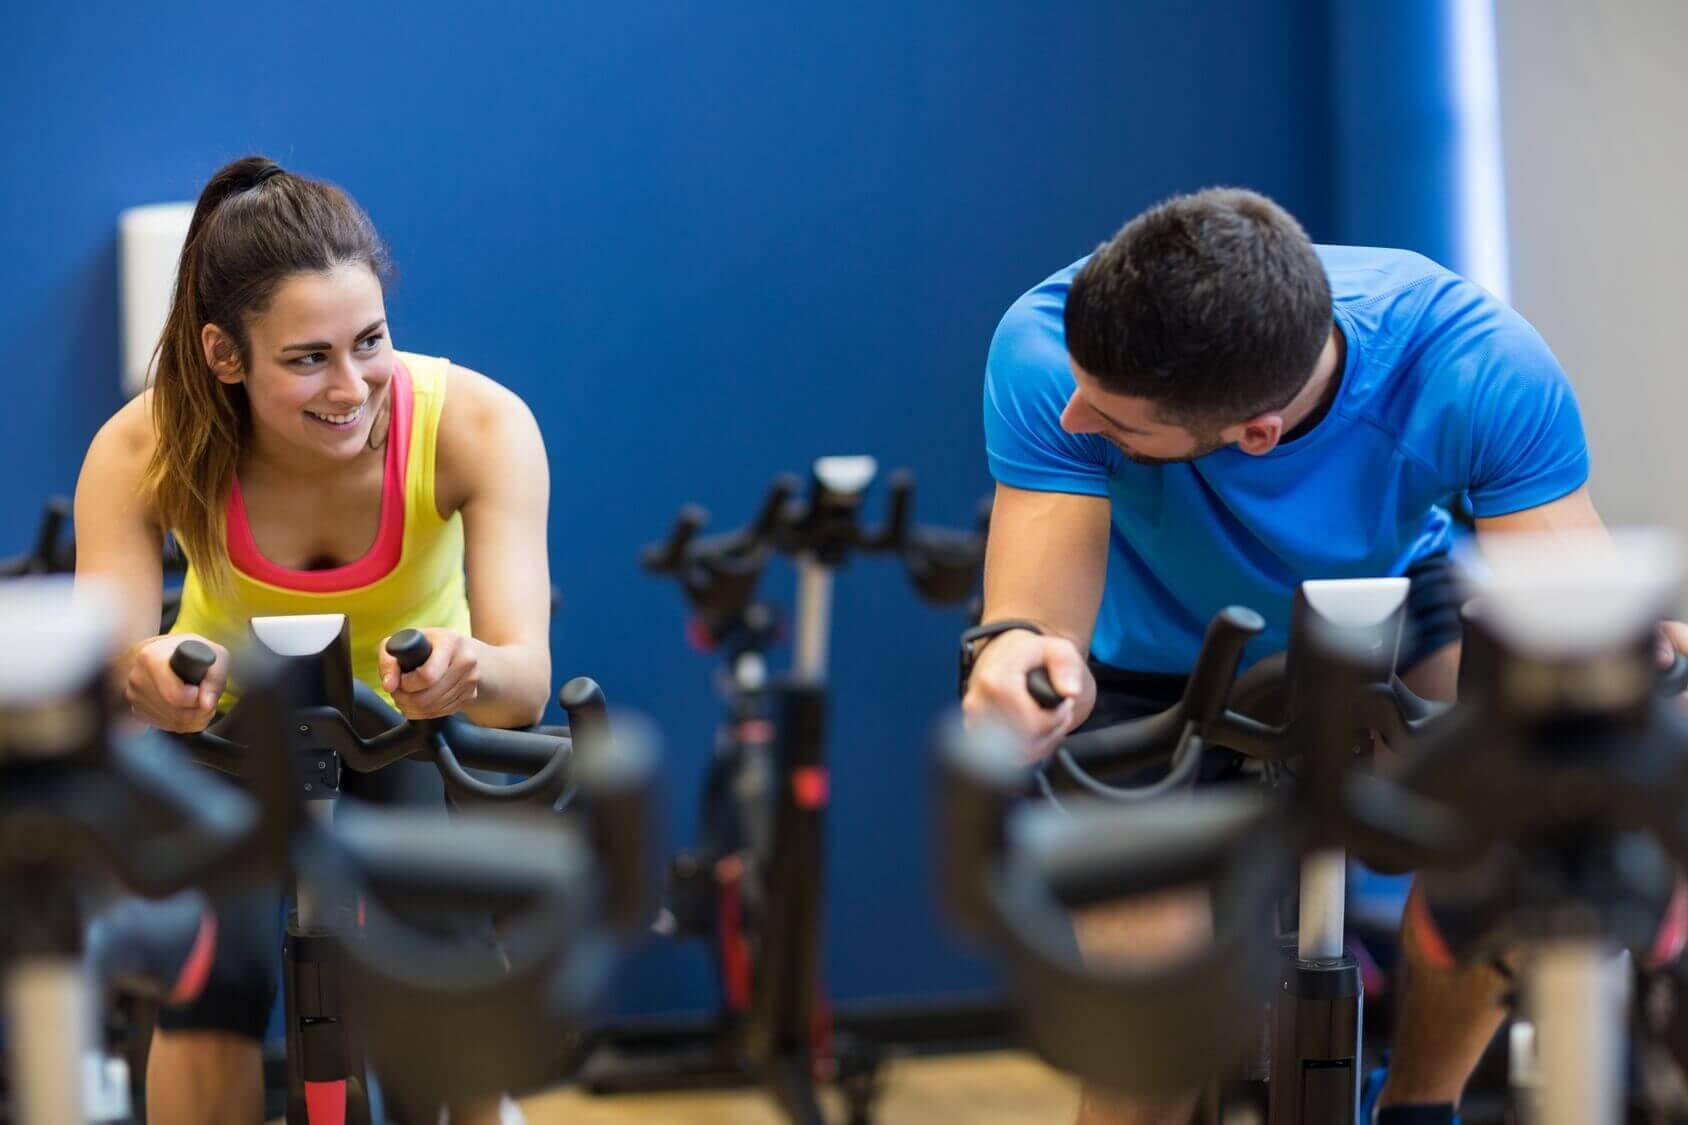 Fitness Freunde finden5 (3)